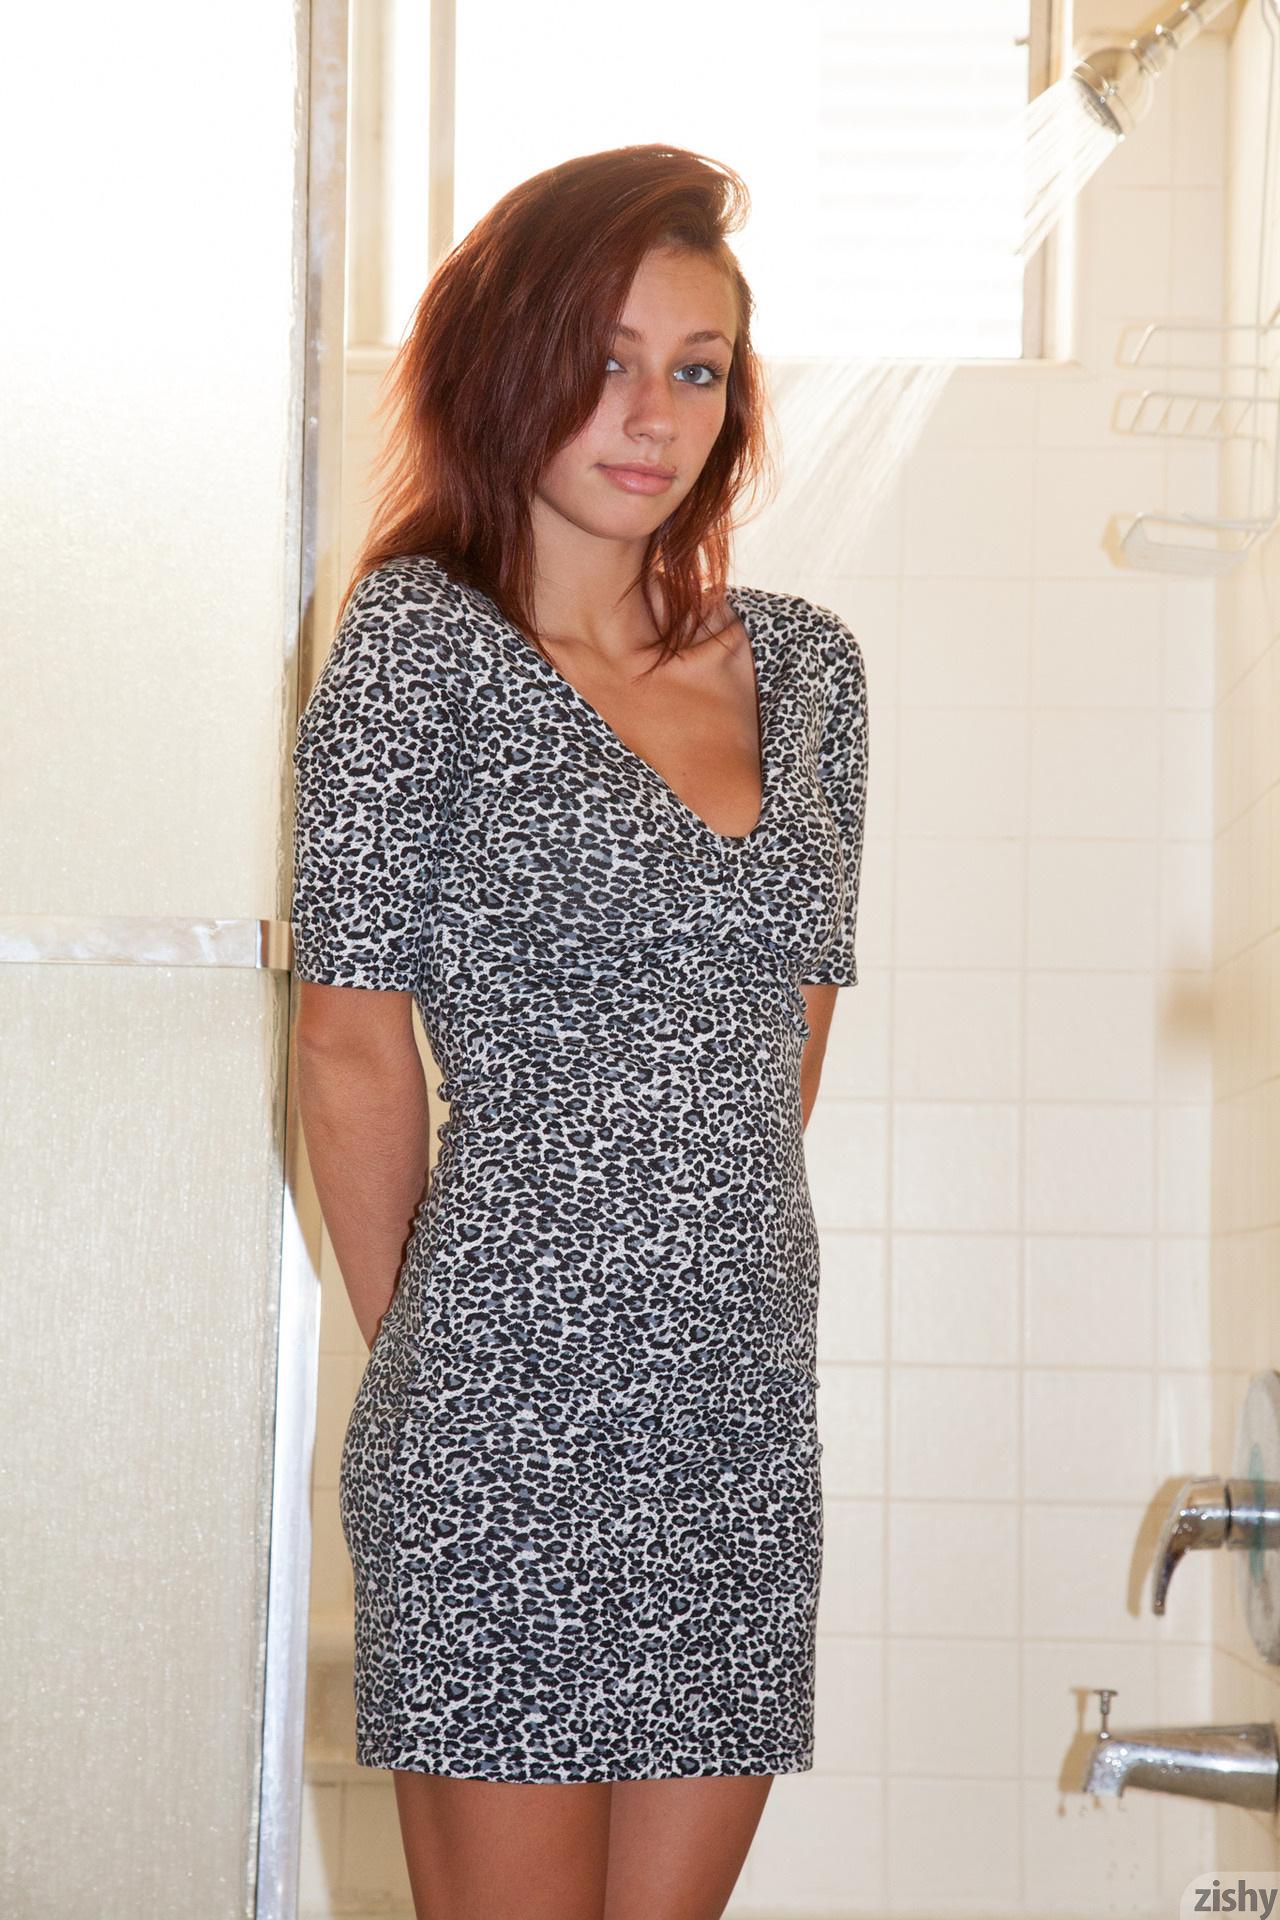 Victoria Lynn Clean The Dirty Zishy (1)